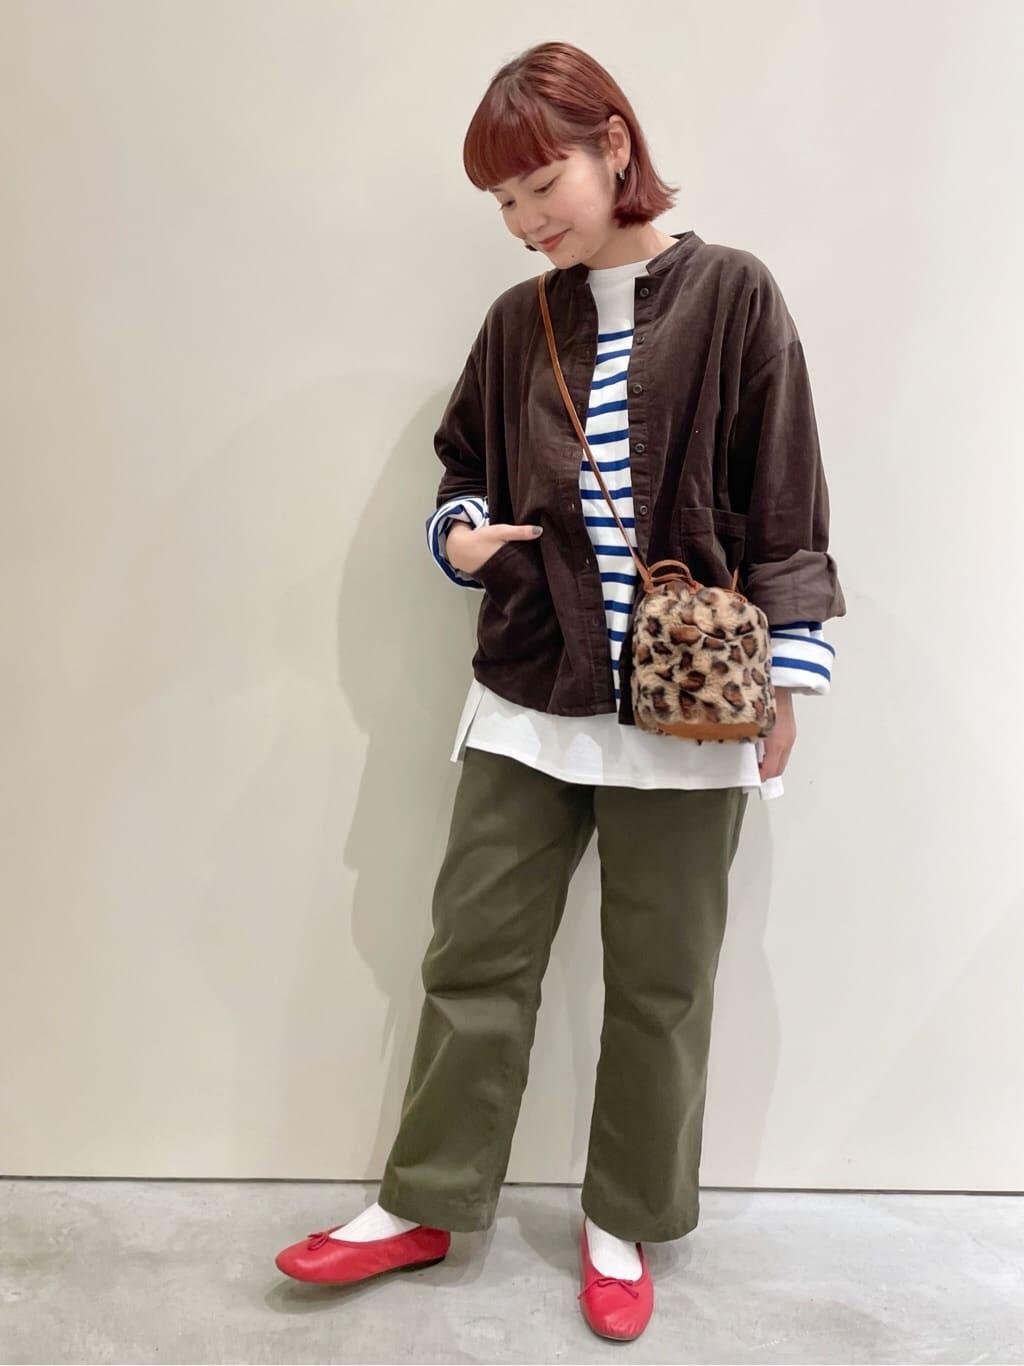 Dot and Stripes CHILD WOMAN CHILD WOMAN , PAR ICI 新宿ミロード 身長:160cm 2021.09.11